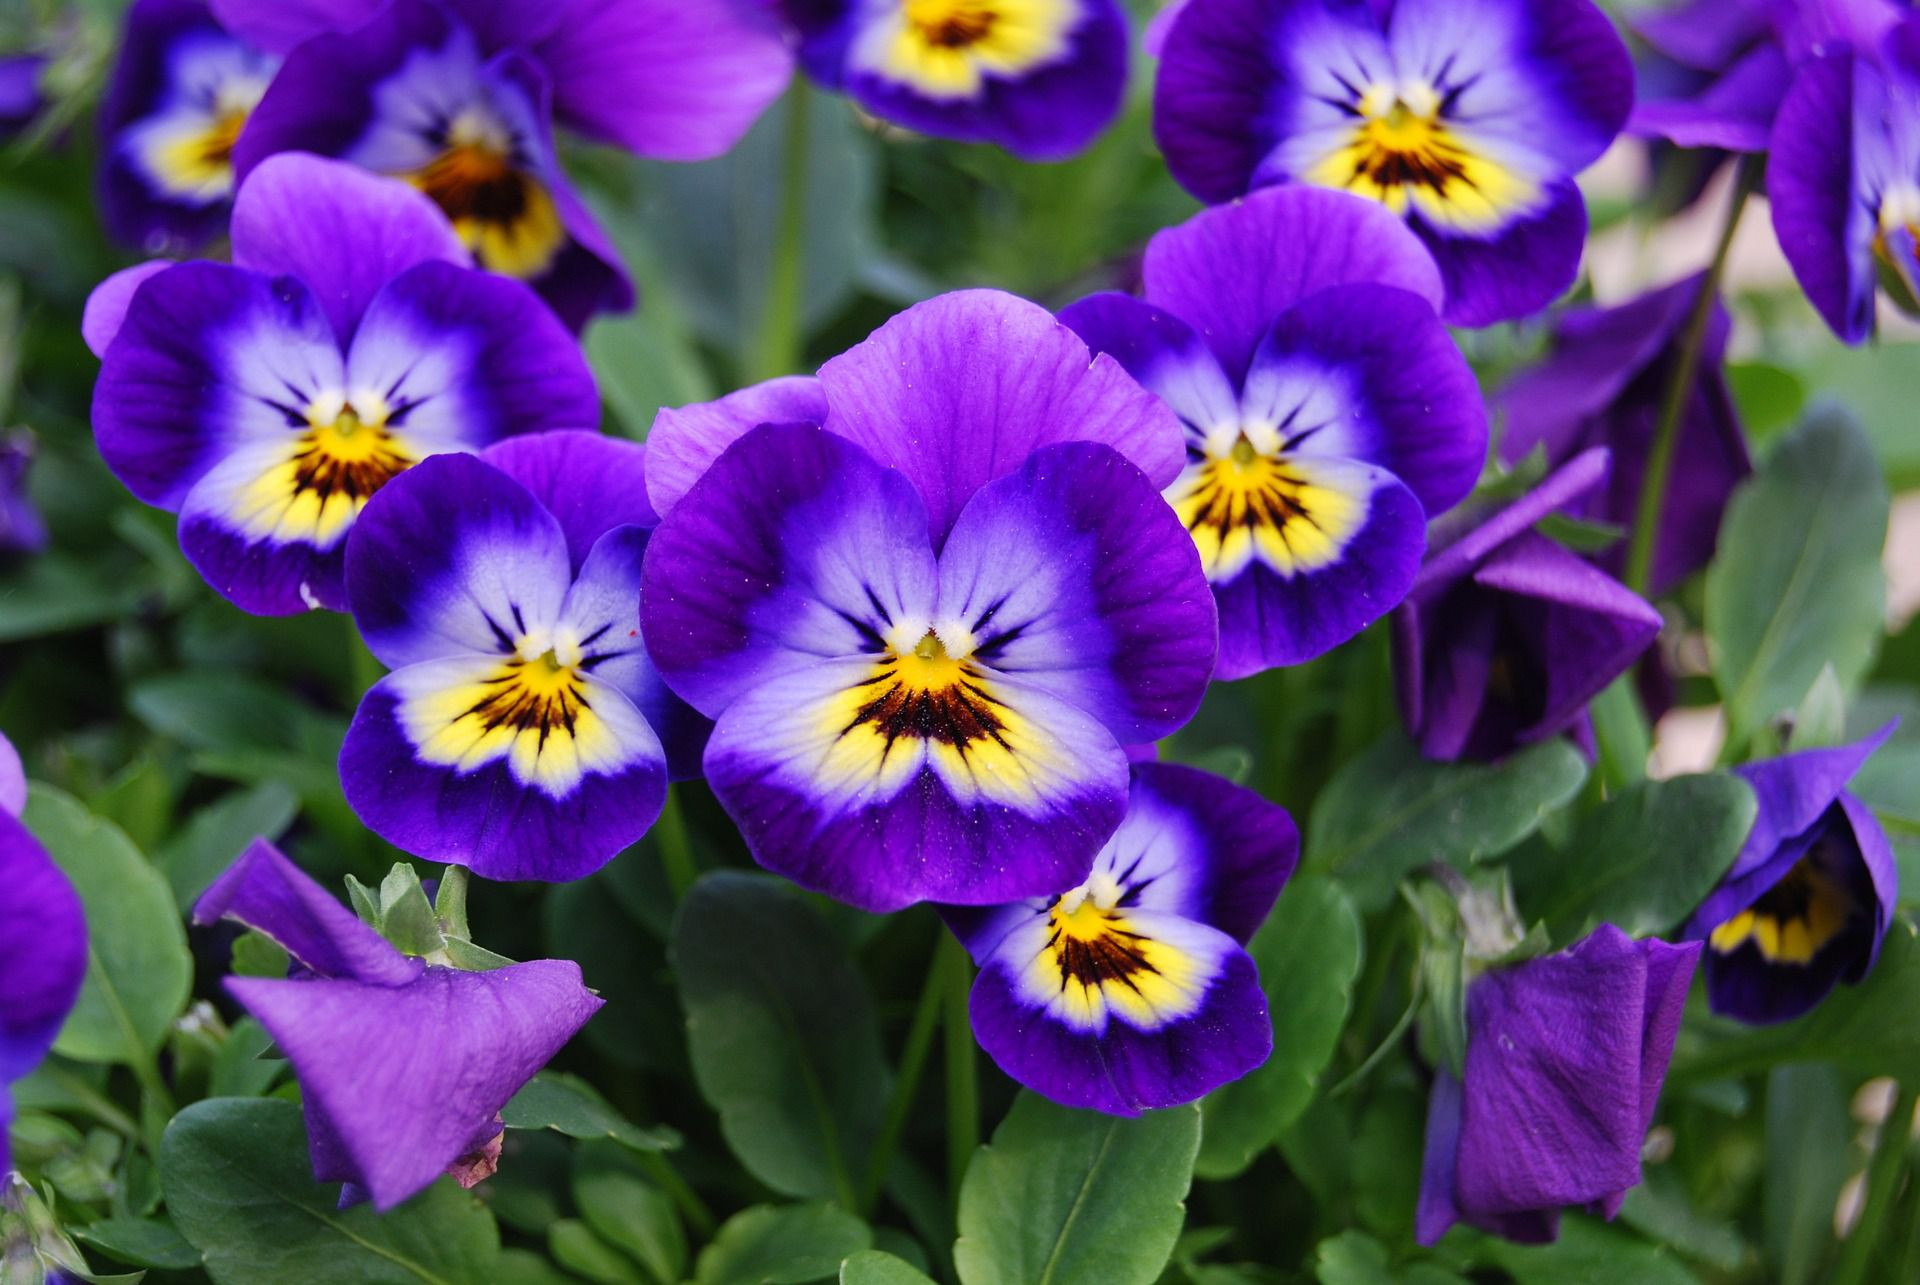 Viola flowers 1920 5894c5563df78caebce06cfc